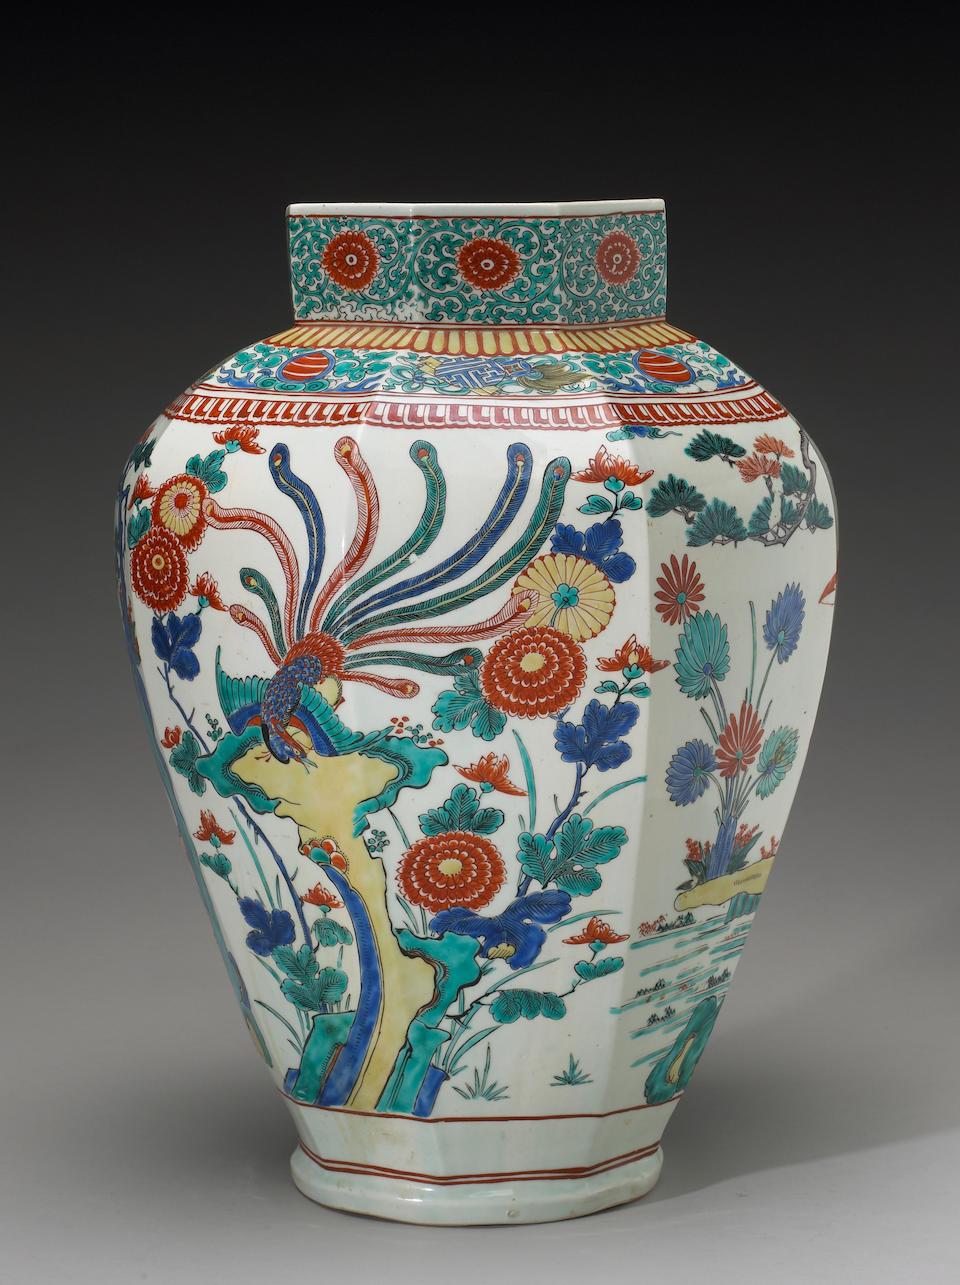 An Arita ware Kakiemon style octagonal porcelain jar Edo Period